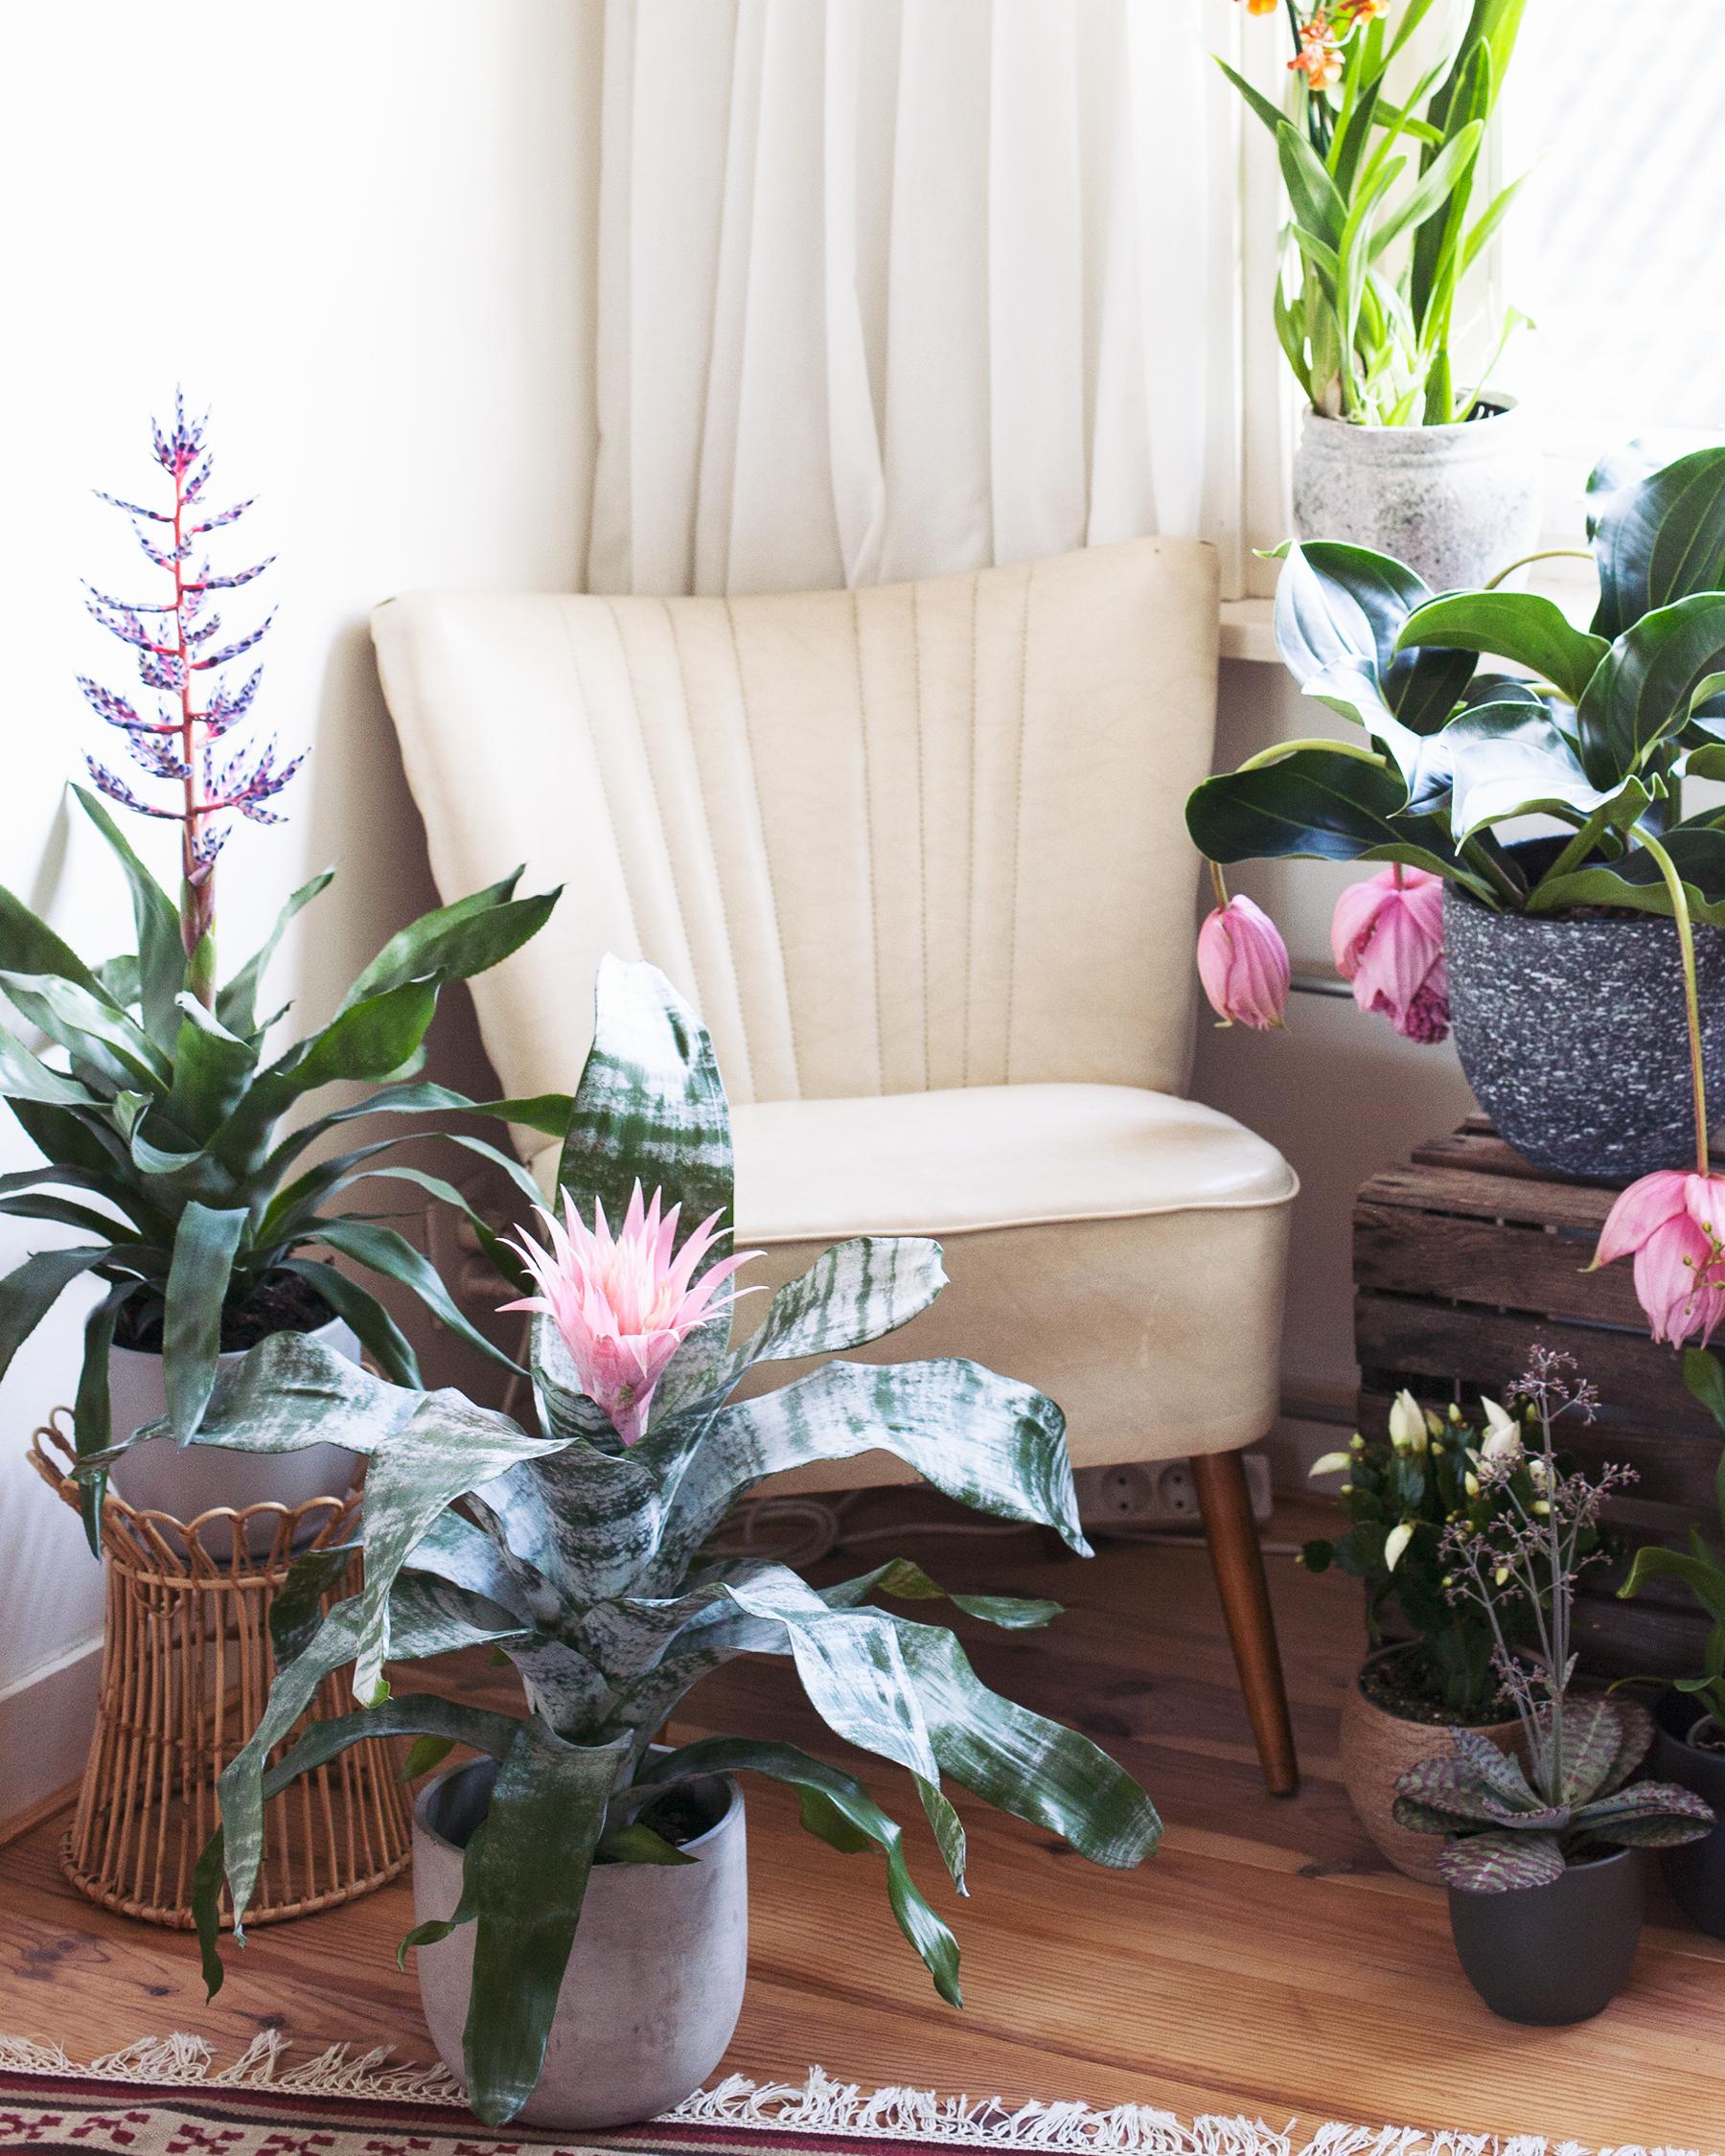 Blog-Bloeiende-Planten_Mama-Botanica_02.jpg